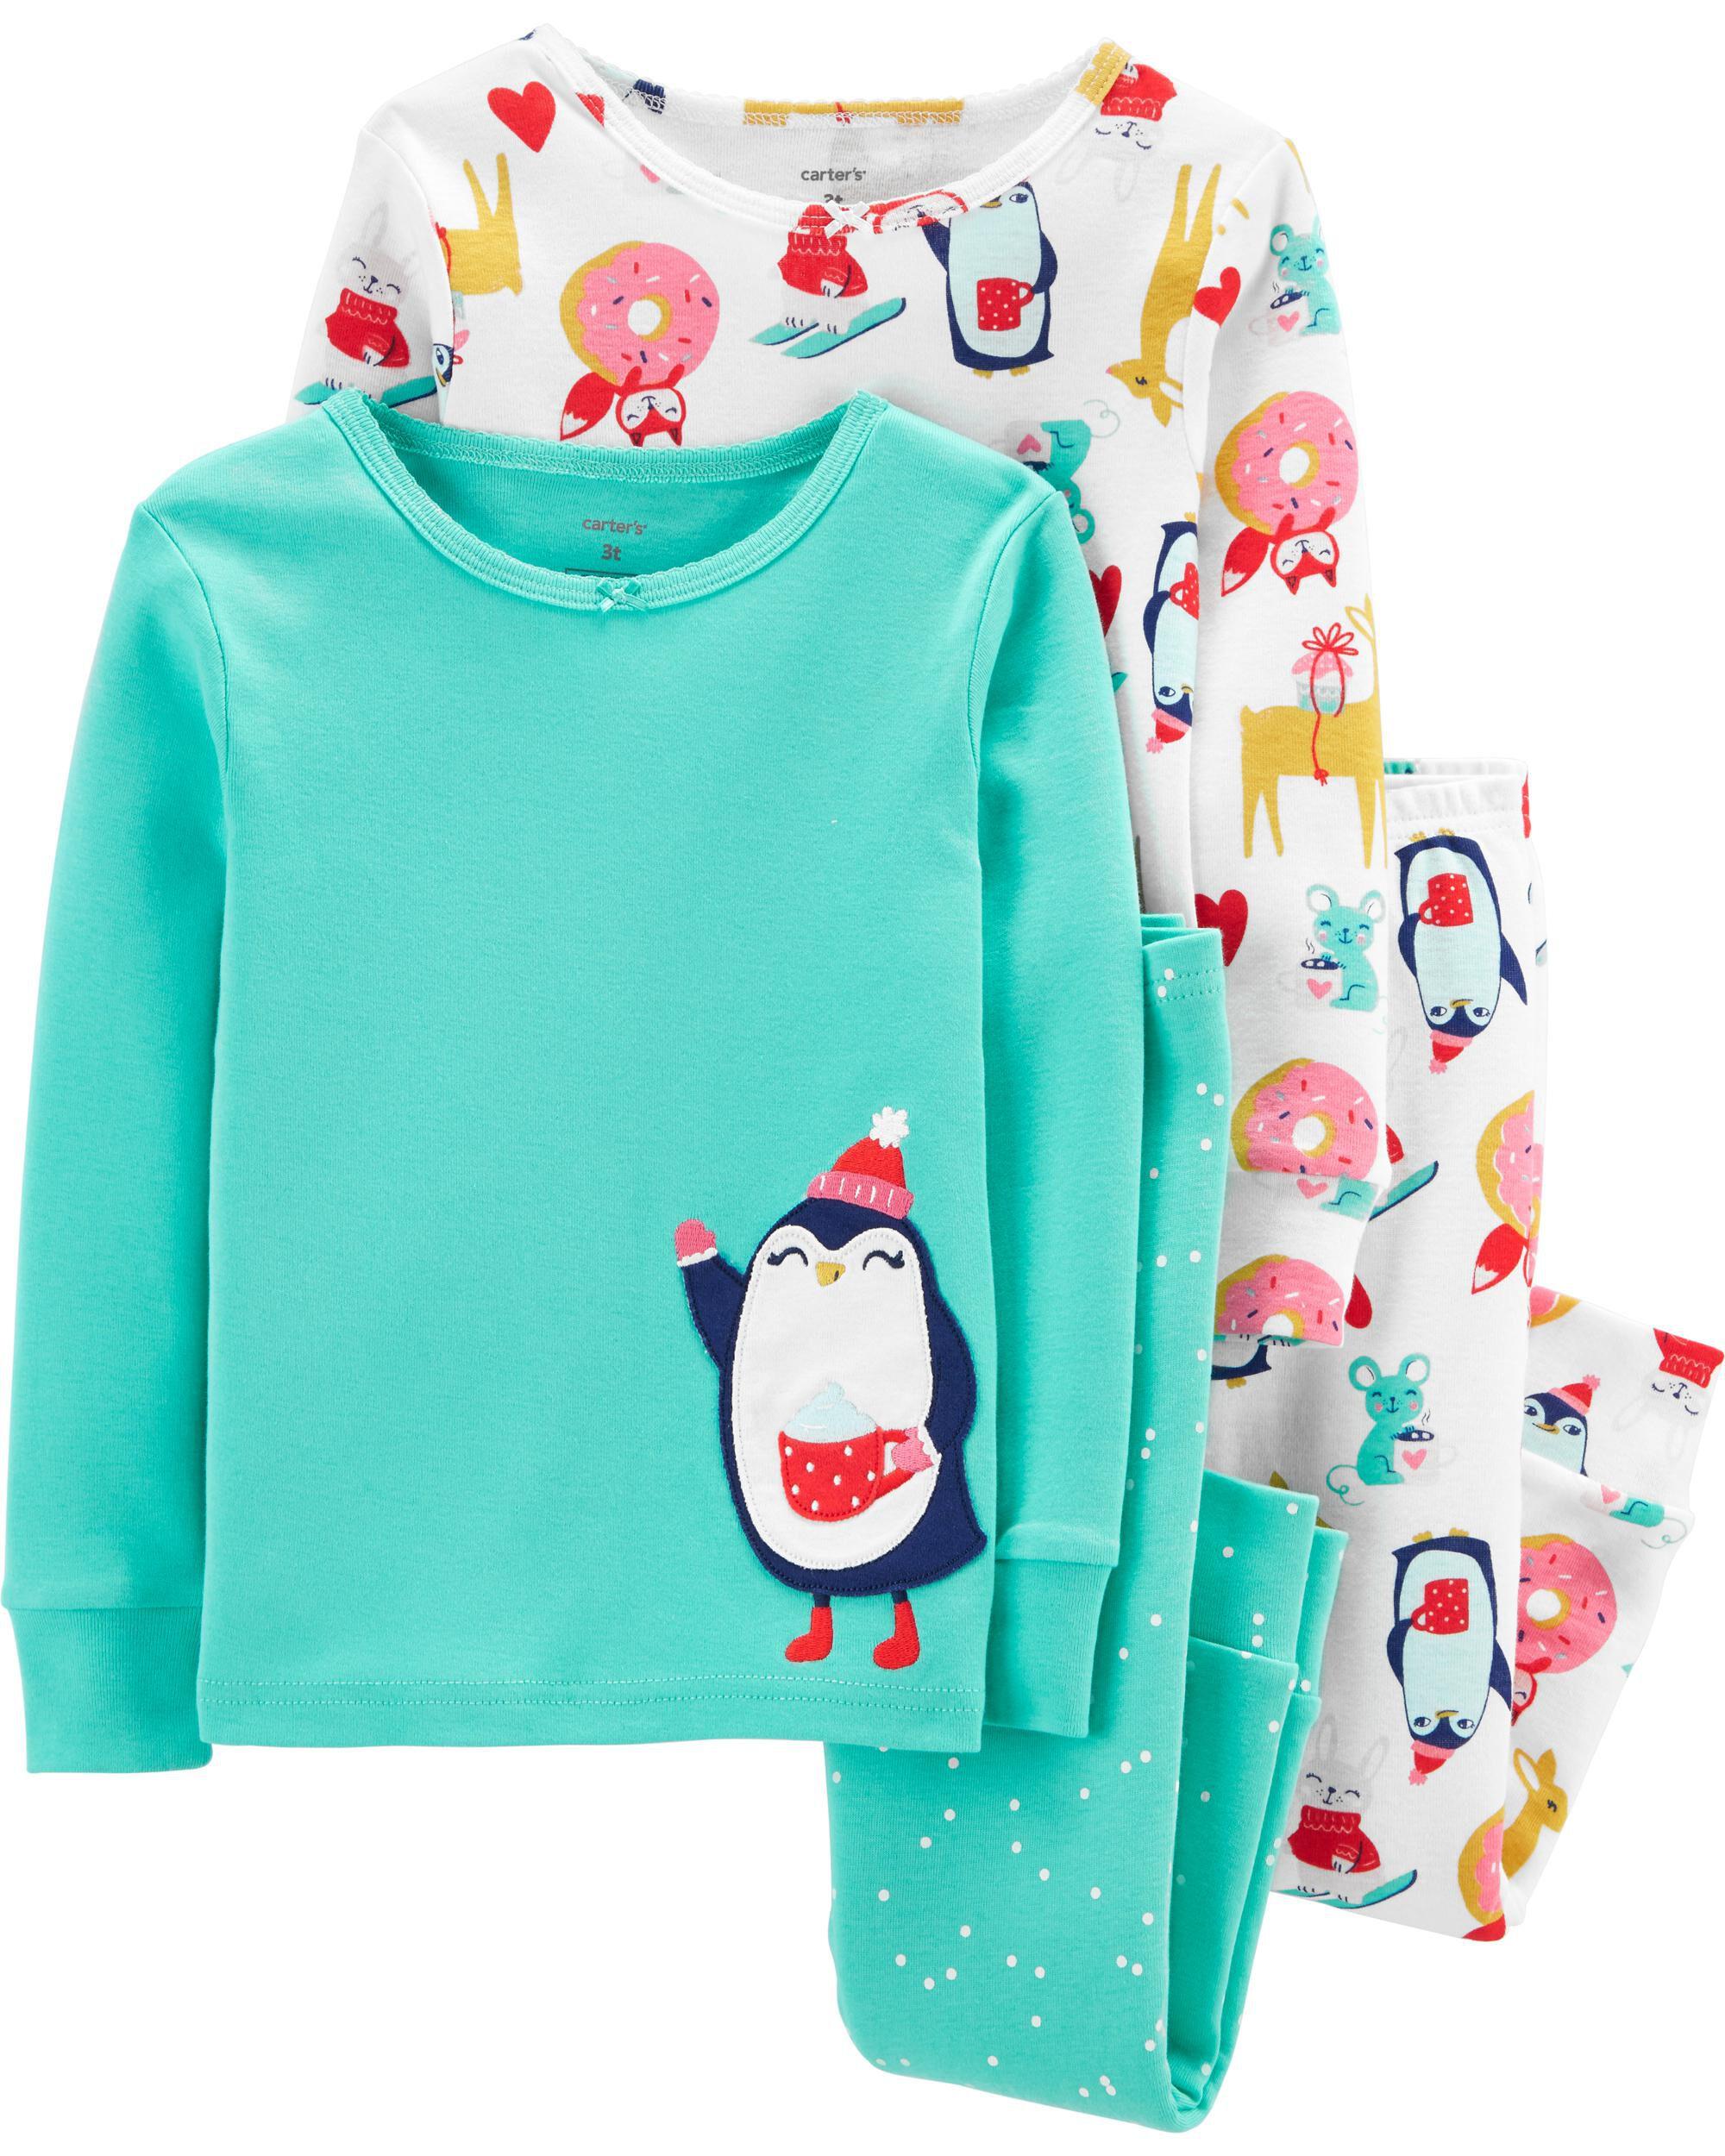 4-Piece Penguin Snug Fit Cotton PJs